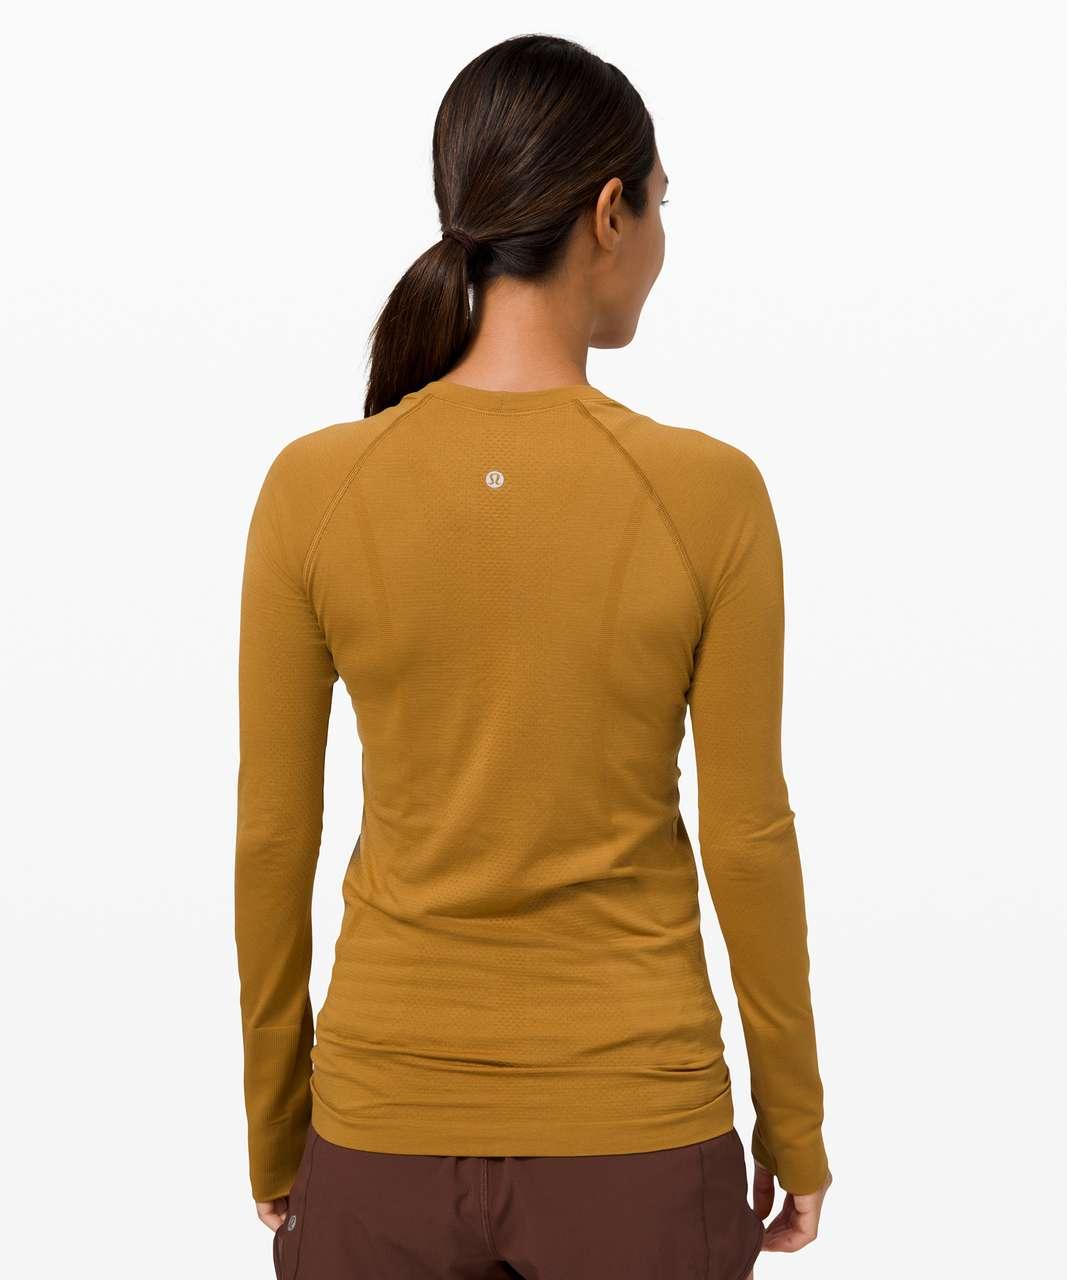 Lululemon Swiftly Tech Long Sleeve 2.0 - Spiced Bronze / Spiced Bronze